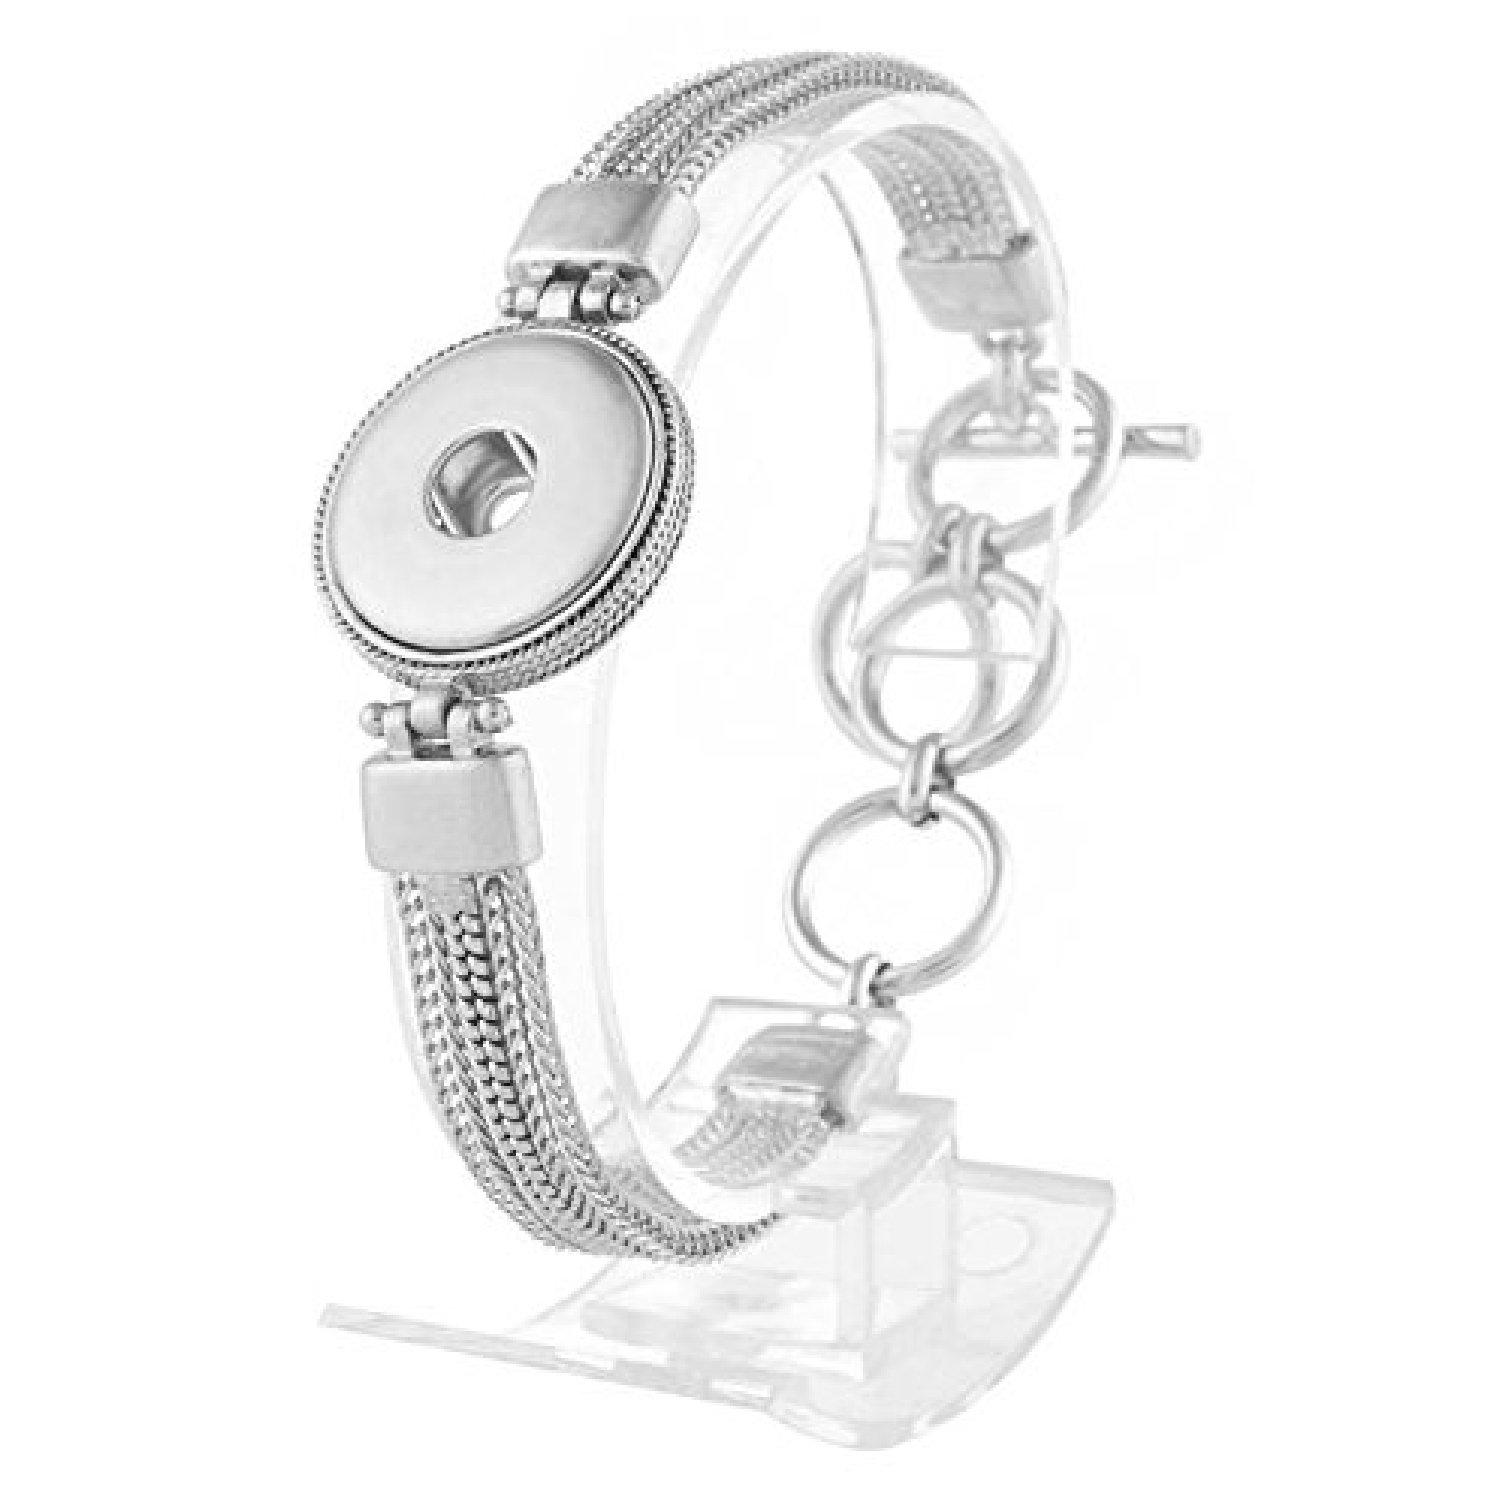 My Prime Gifts Snap Jewelry Toggle Silver Strand Bracelet Length 6.75-8.5 Holds 18-20mm Standard Snaps